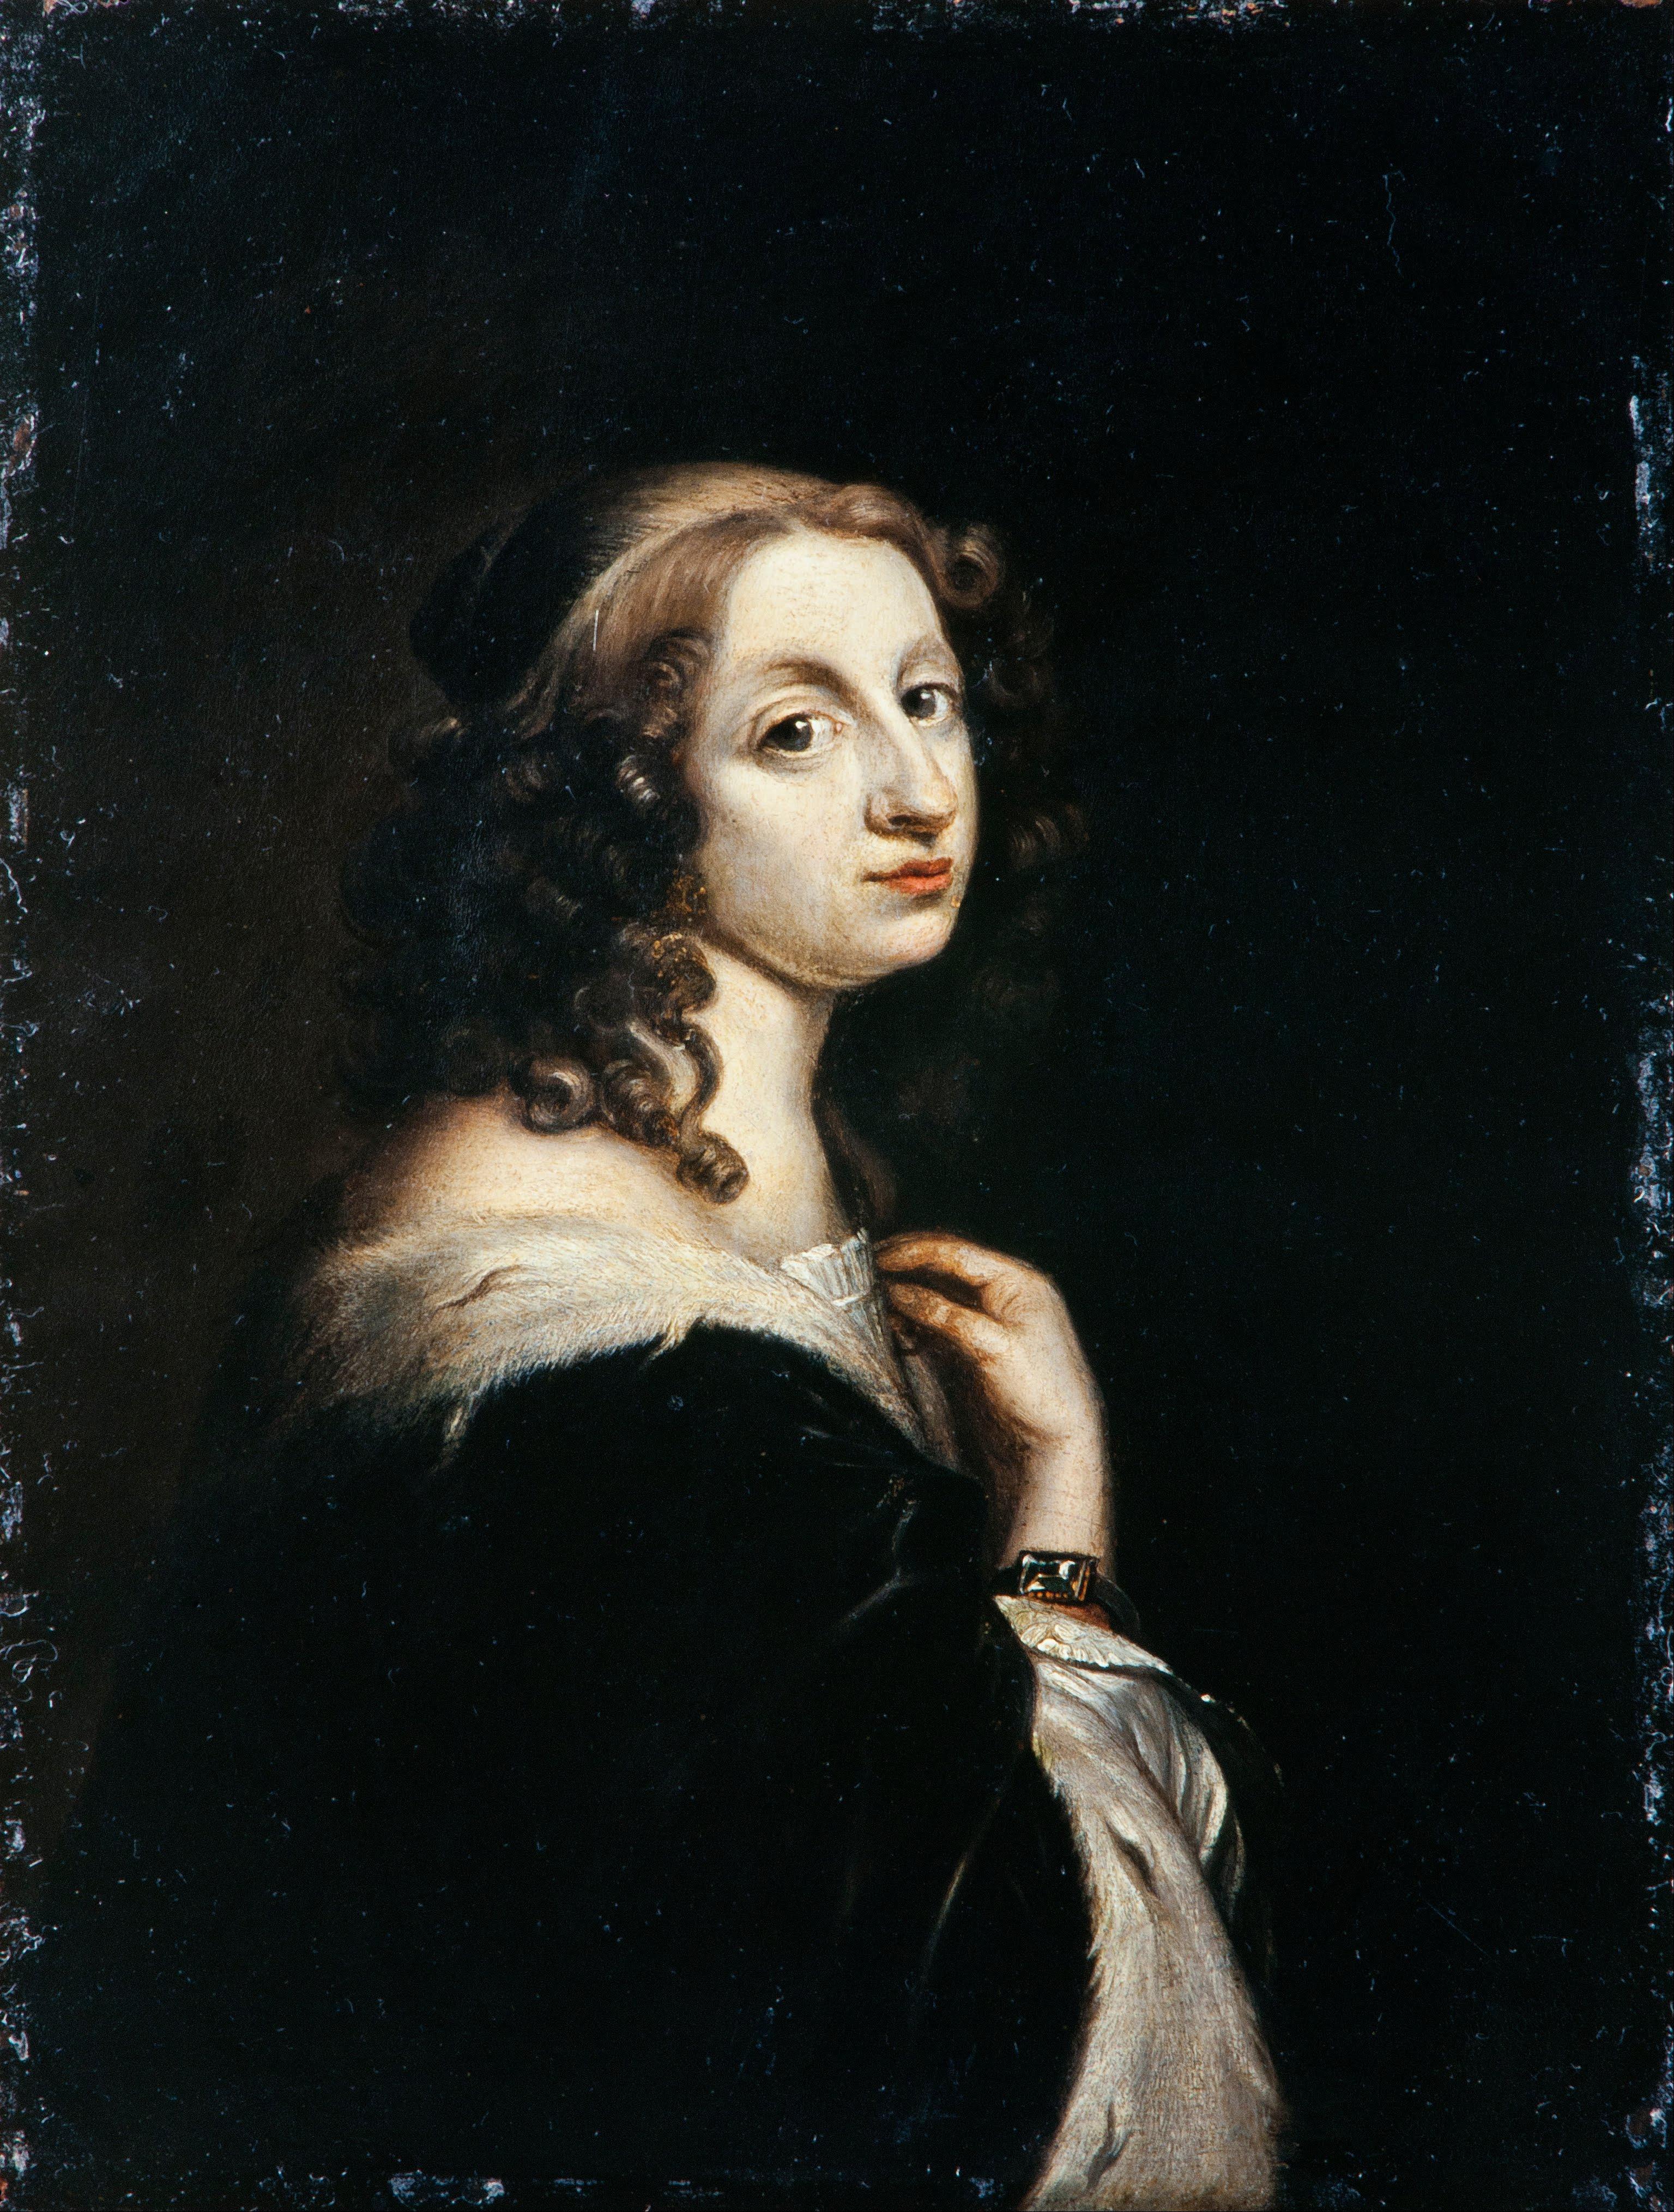 17th century homosexual art